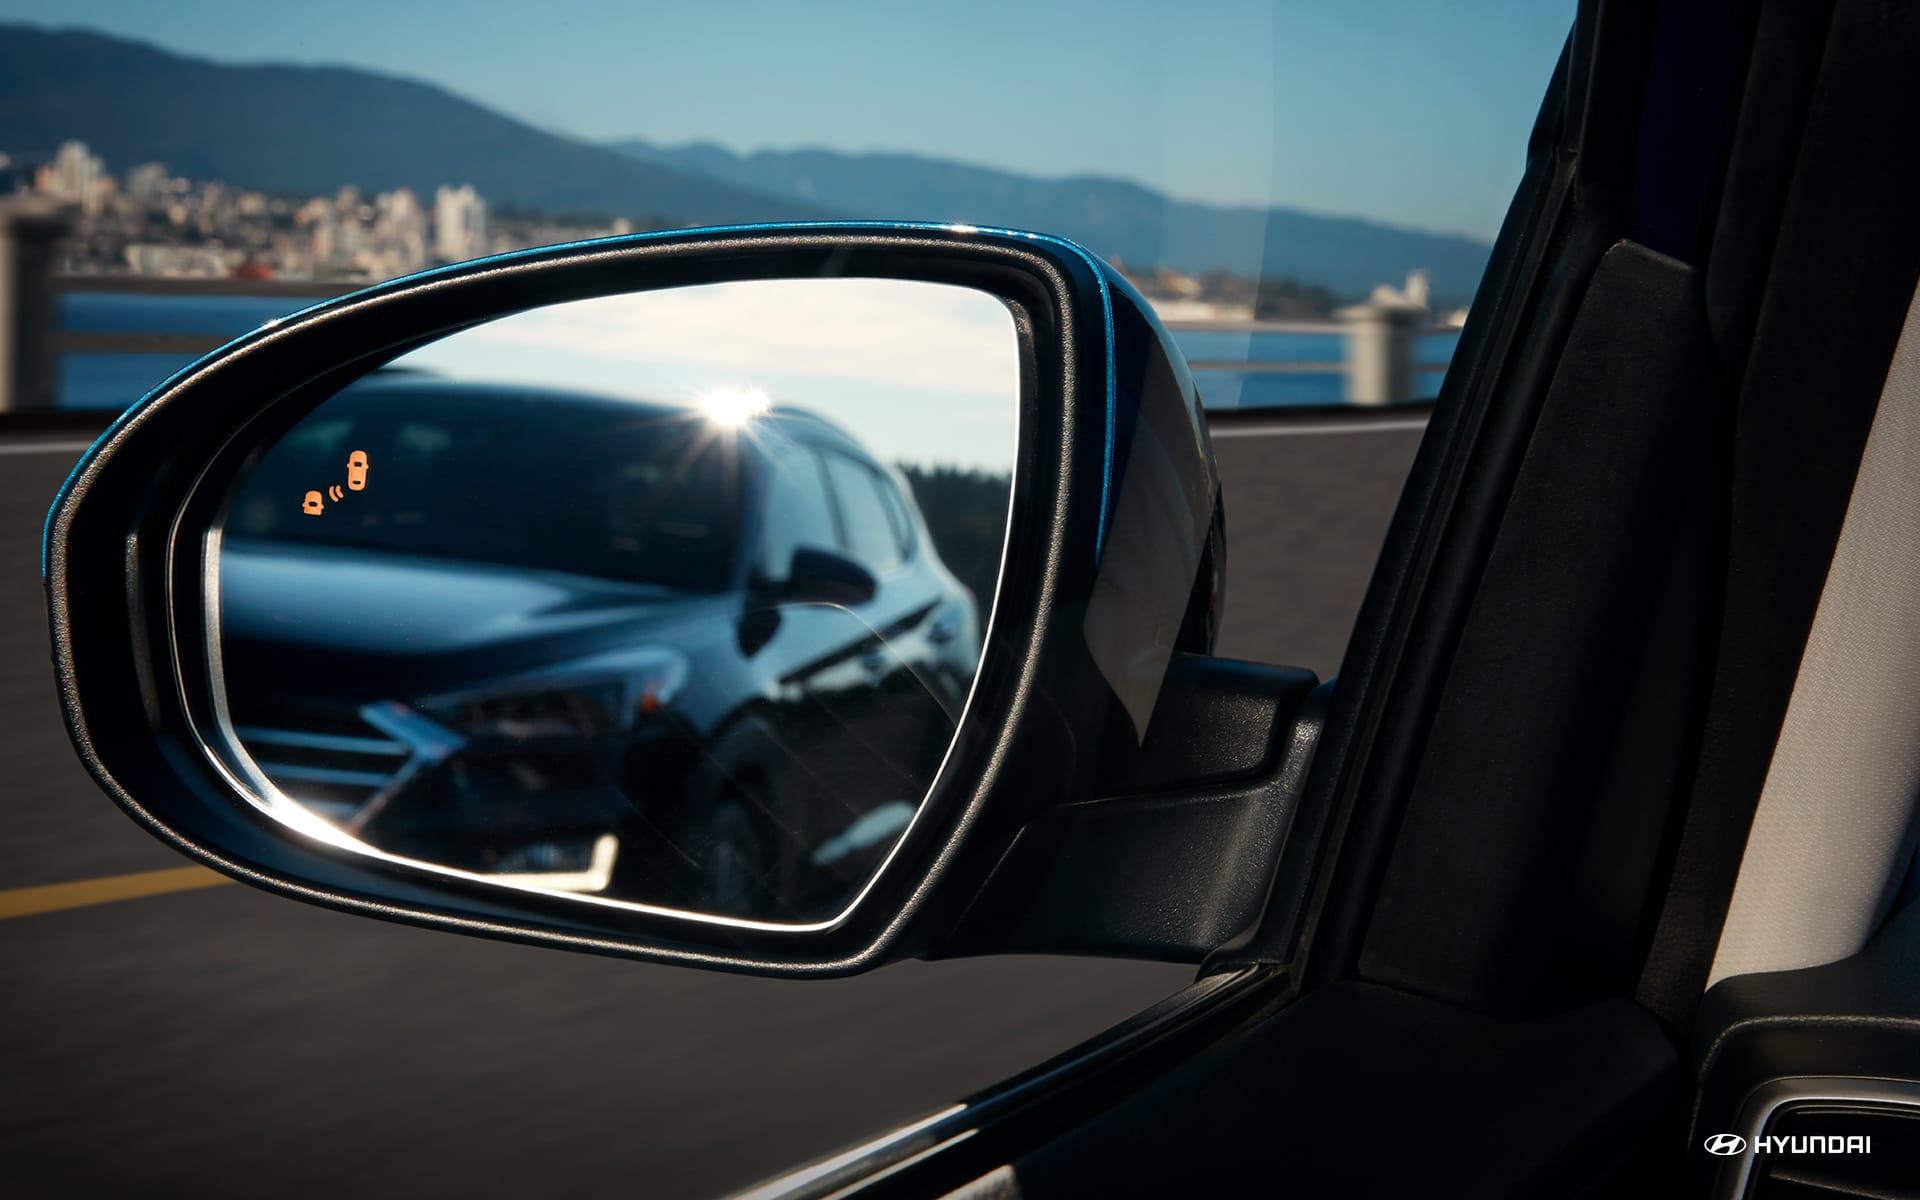 Stay Alert in the 2020 Hyundai Tucson